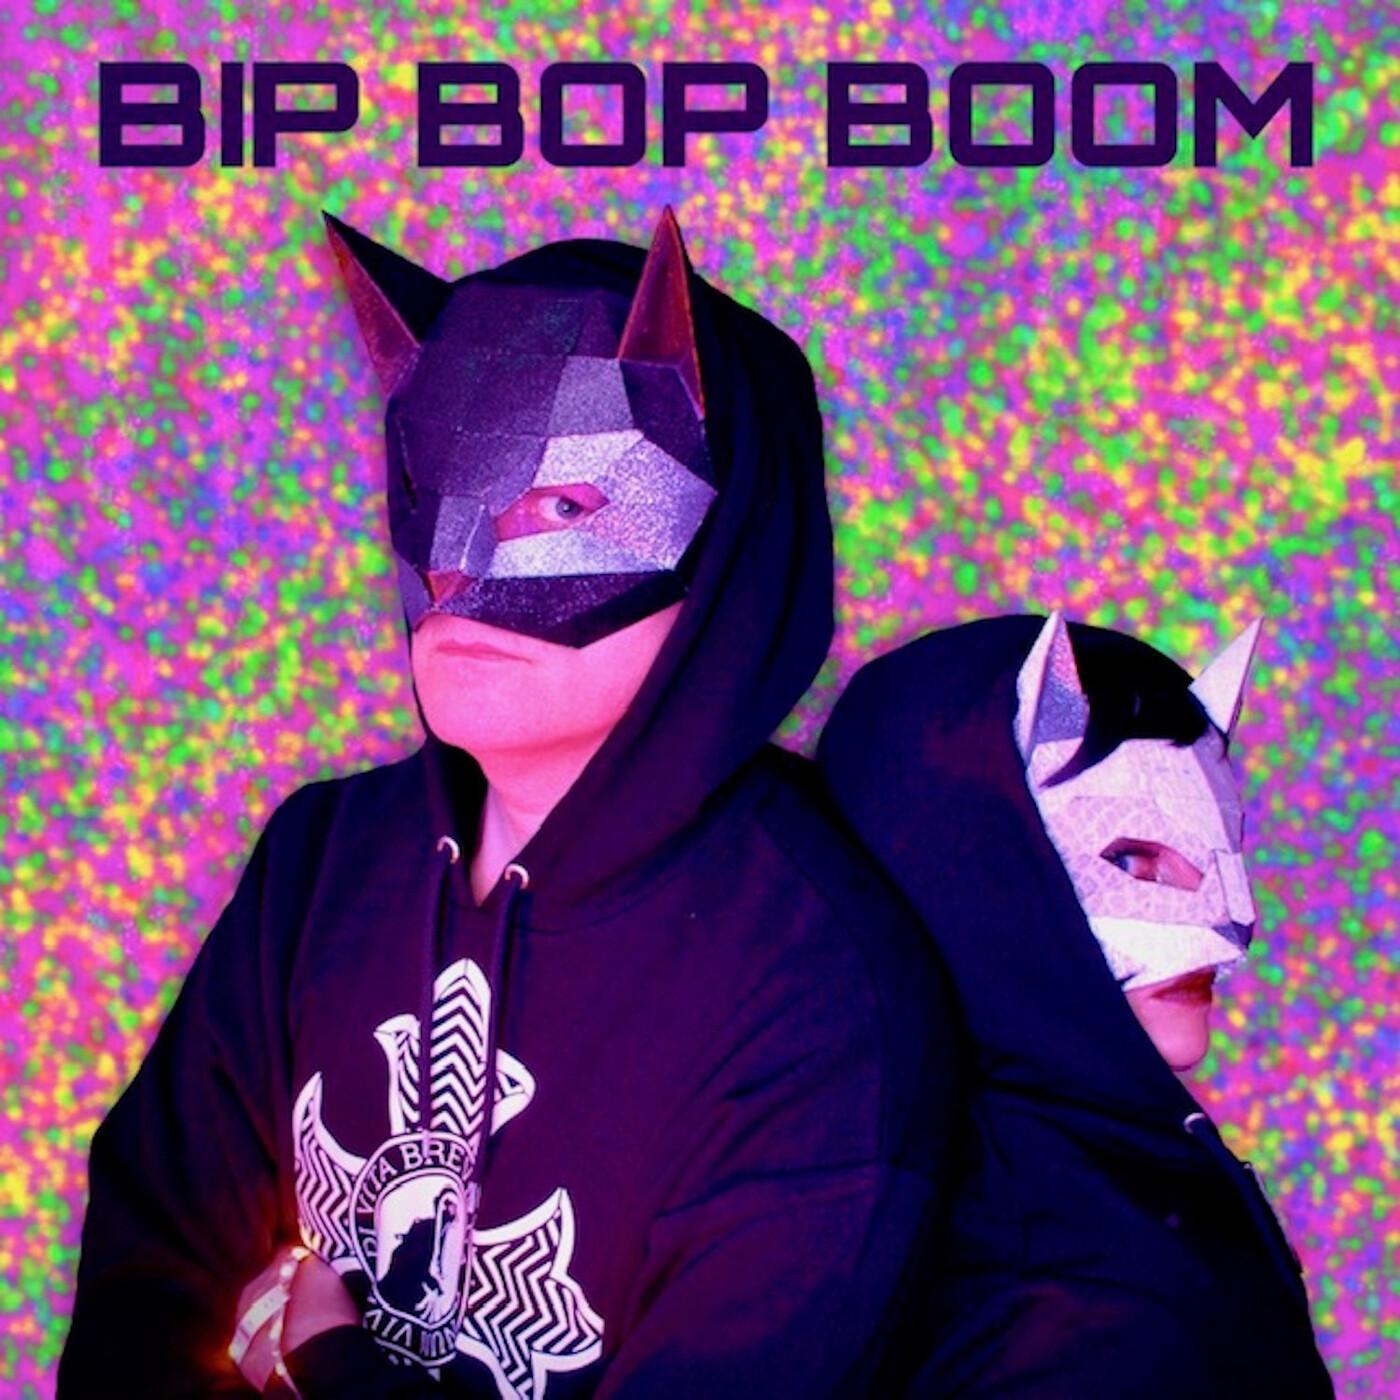 Lady Bip, Mr. Bop, BIP BOP BOO